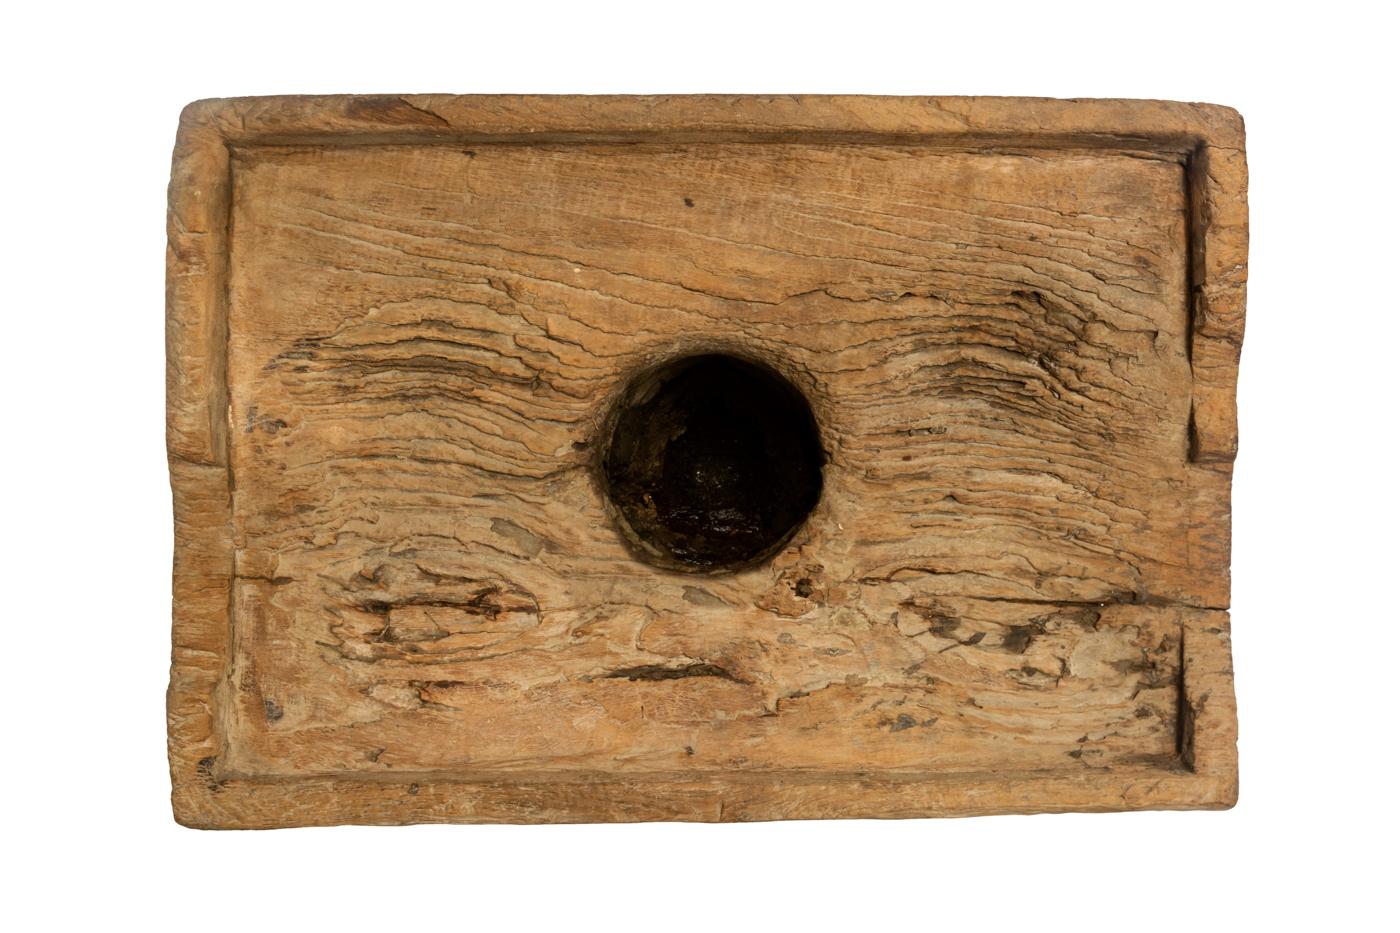 Lesung decorativo en madera